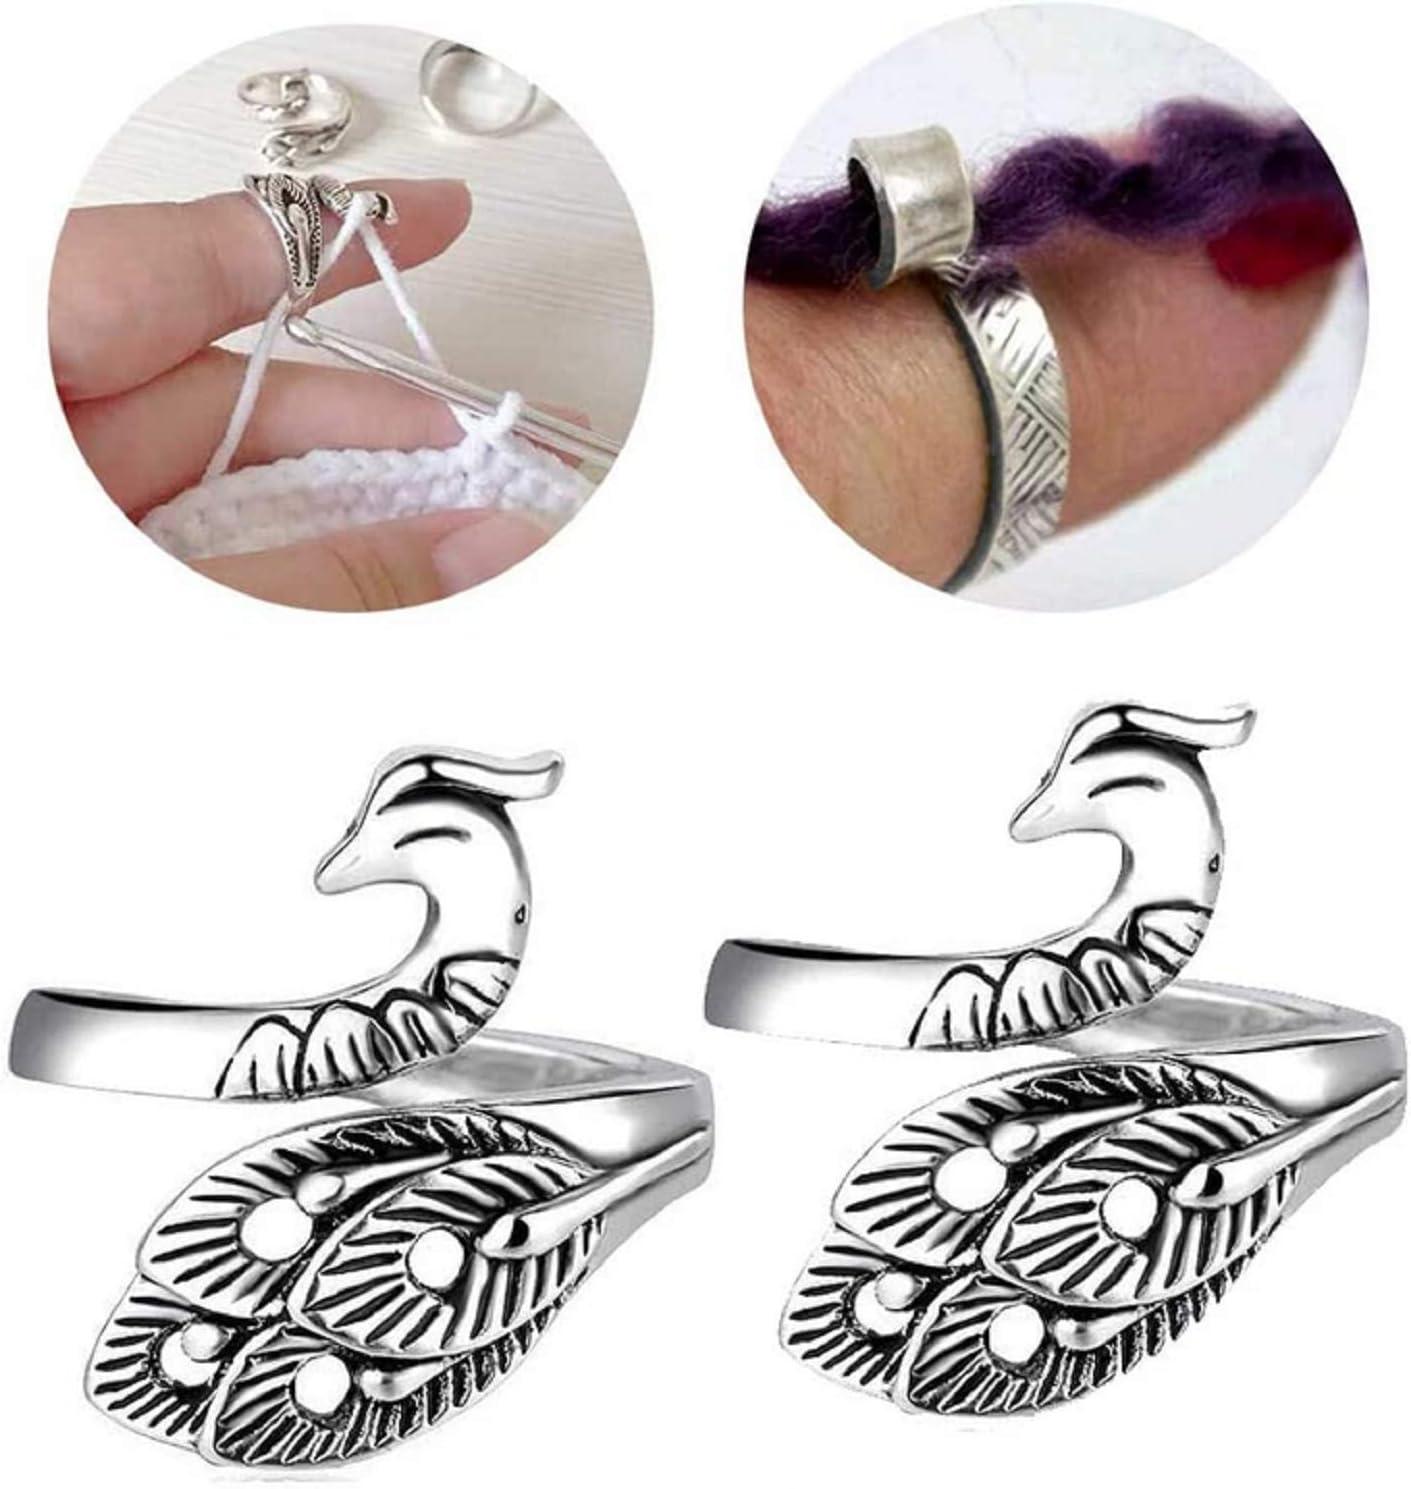 Adjustable Knitting Loop Popular standard Crochet Phoenix Loo Ring Super-cheap Advanced